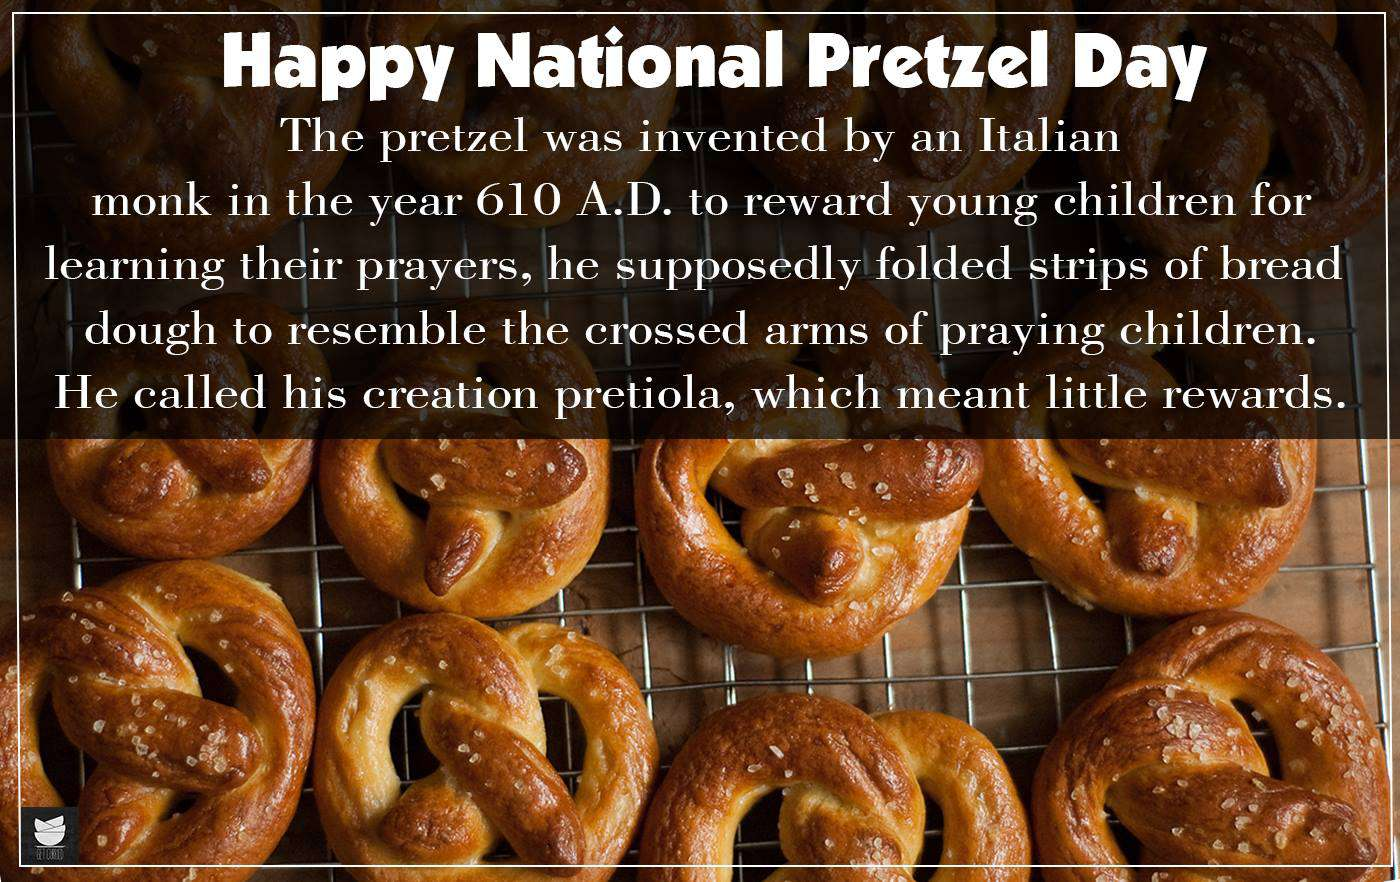 National Pretzel Day Wishes Images download